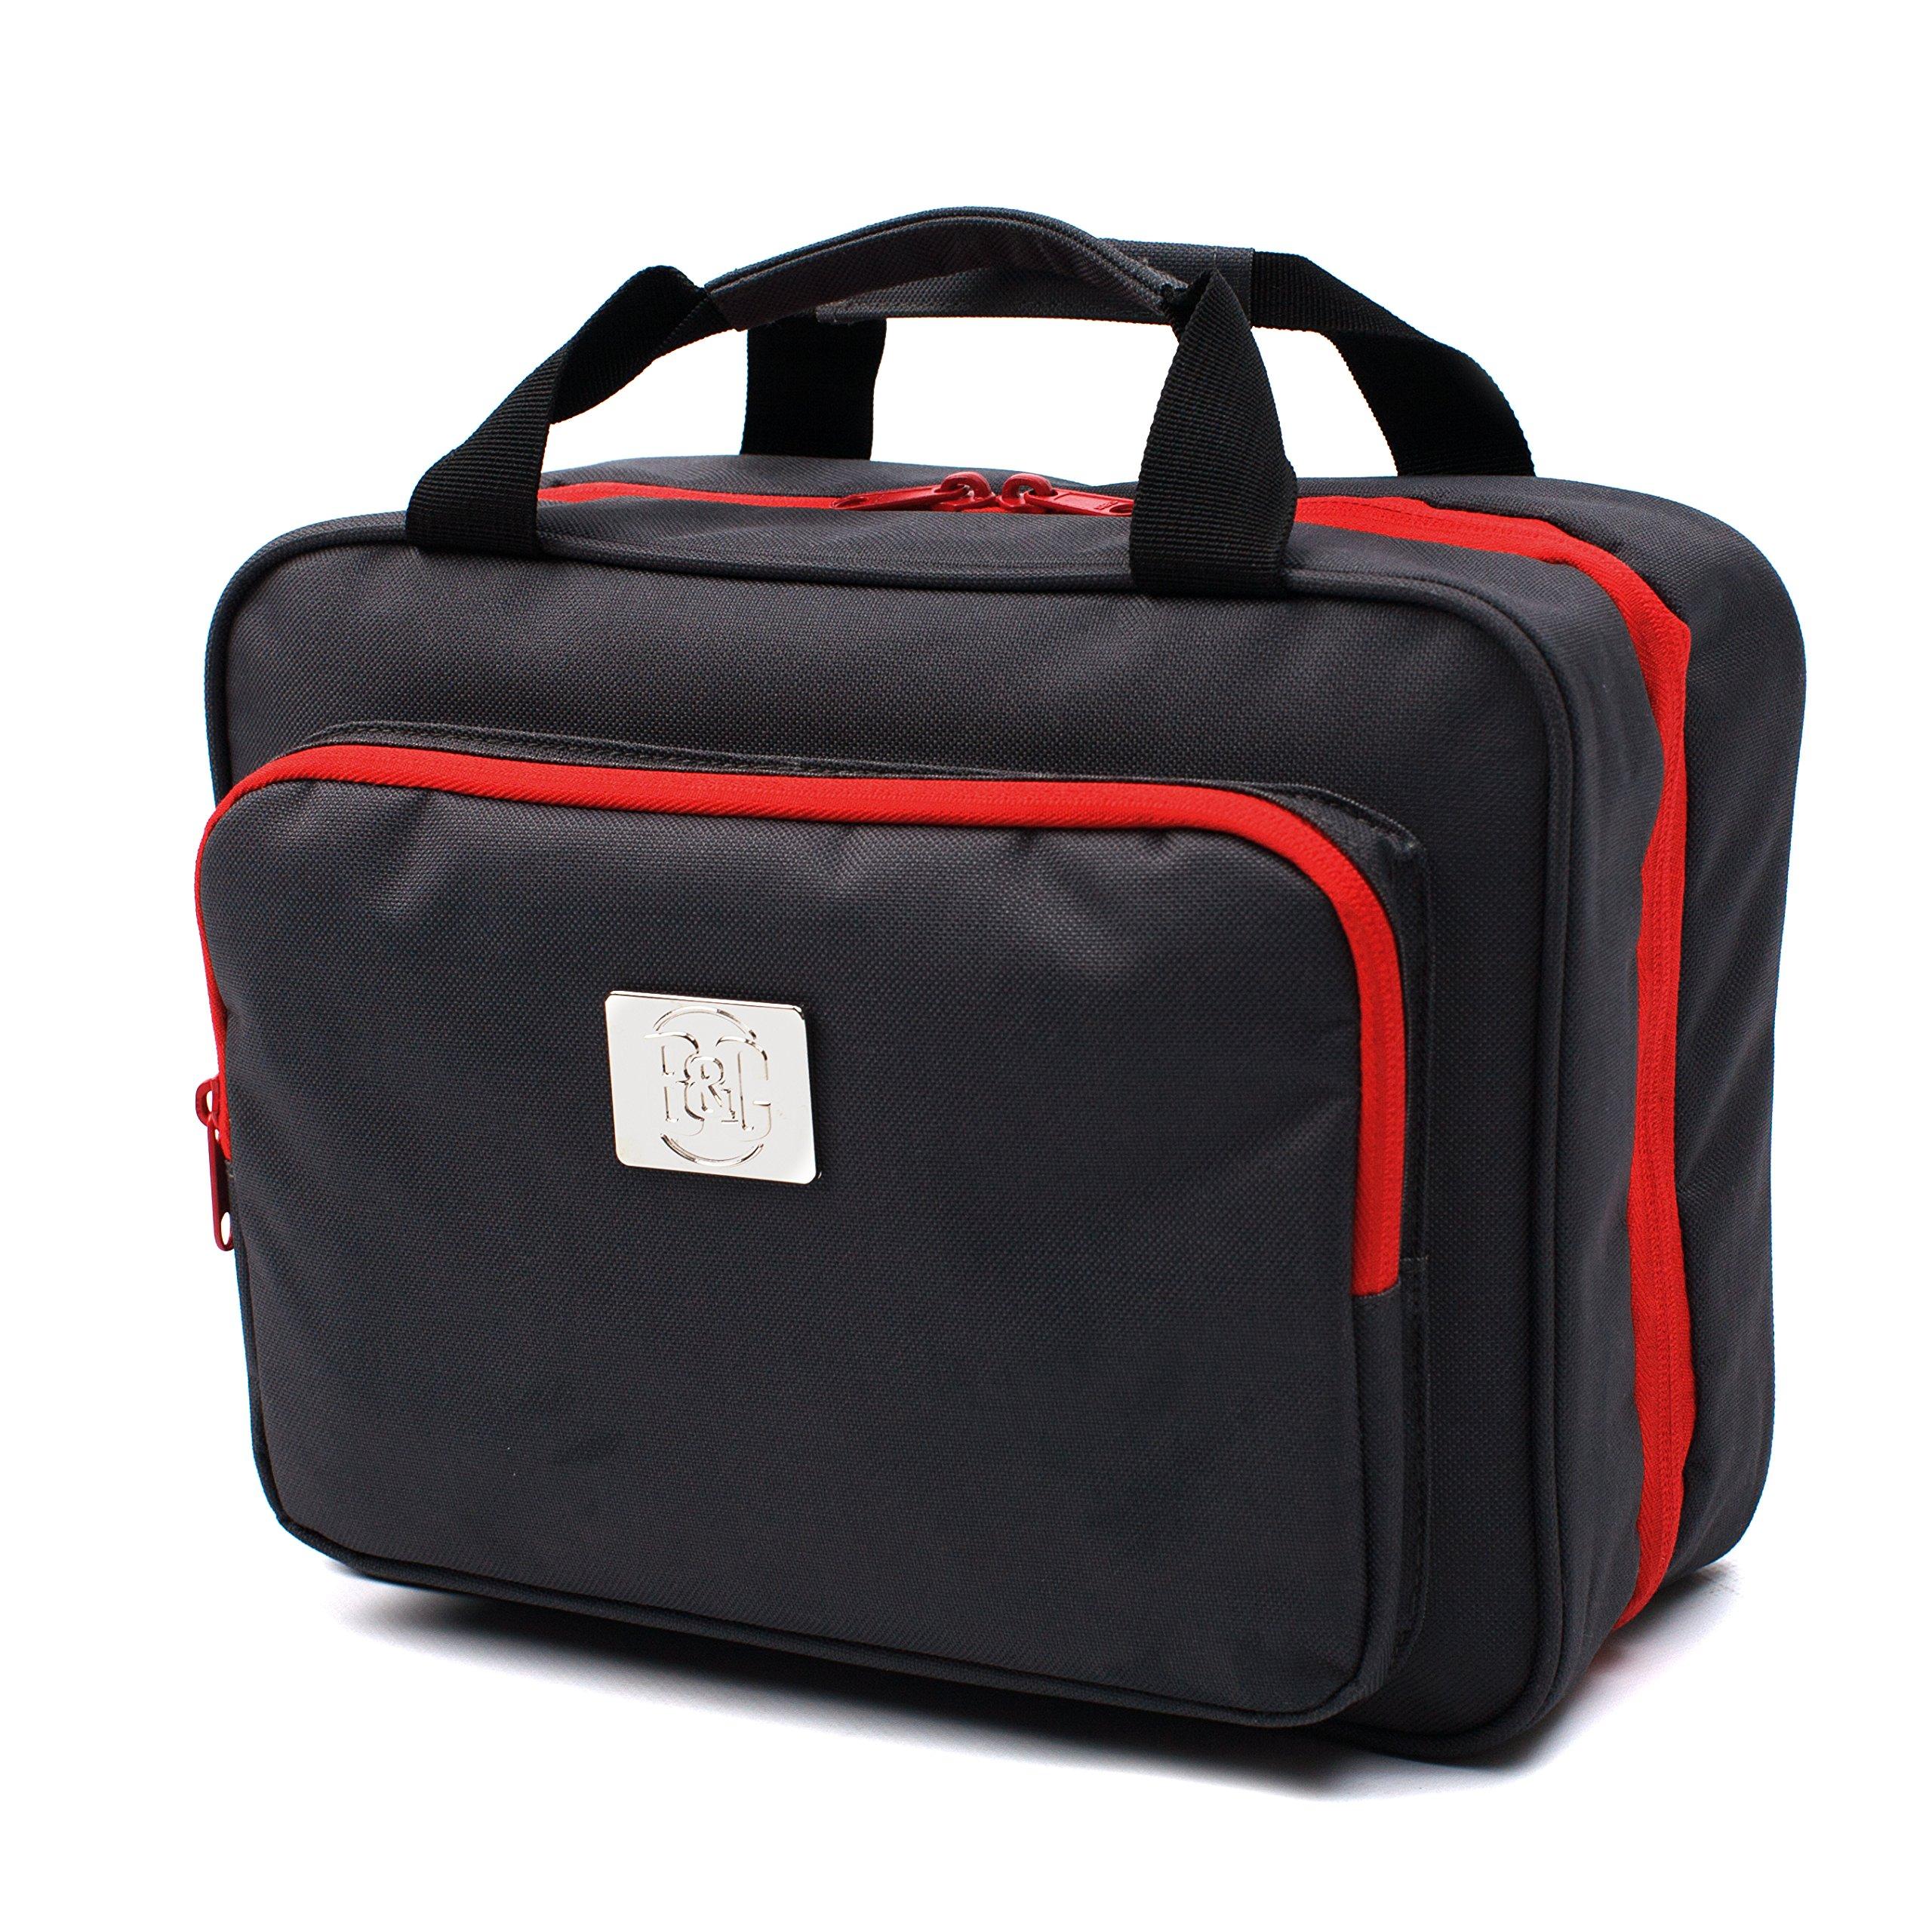 0be363105b69 Amazon.com   Large Versatile Travel Cosmetic Bag - Perfect Hanging Travel  Toiletry Organizer (XL Grey)   Beauty